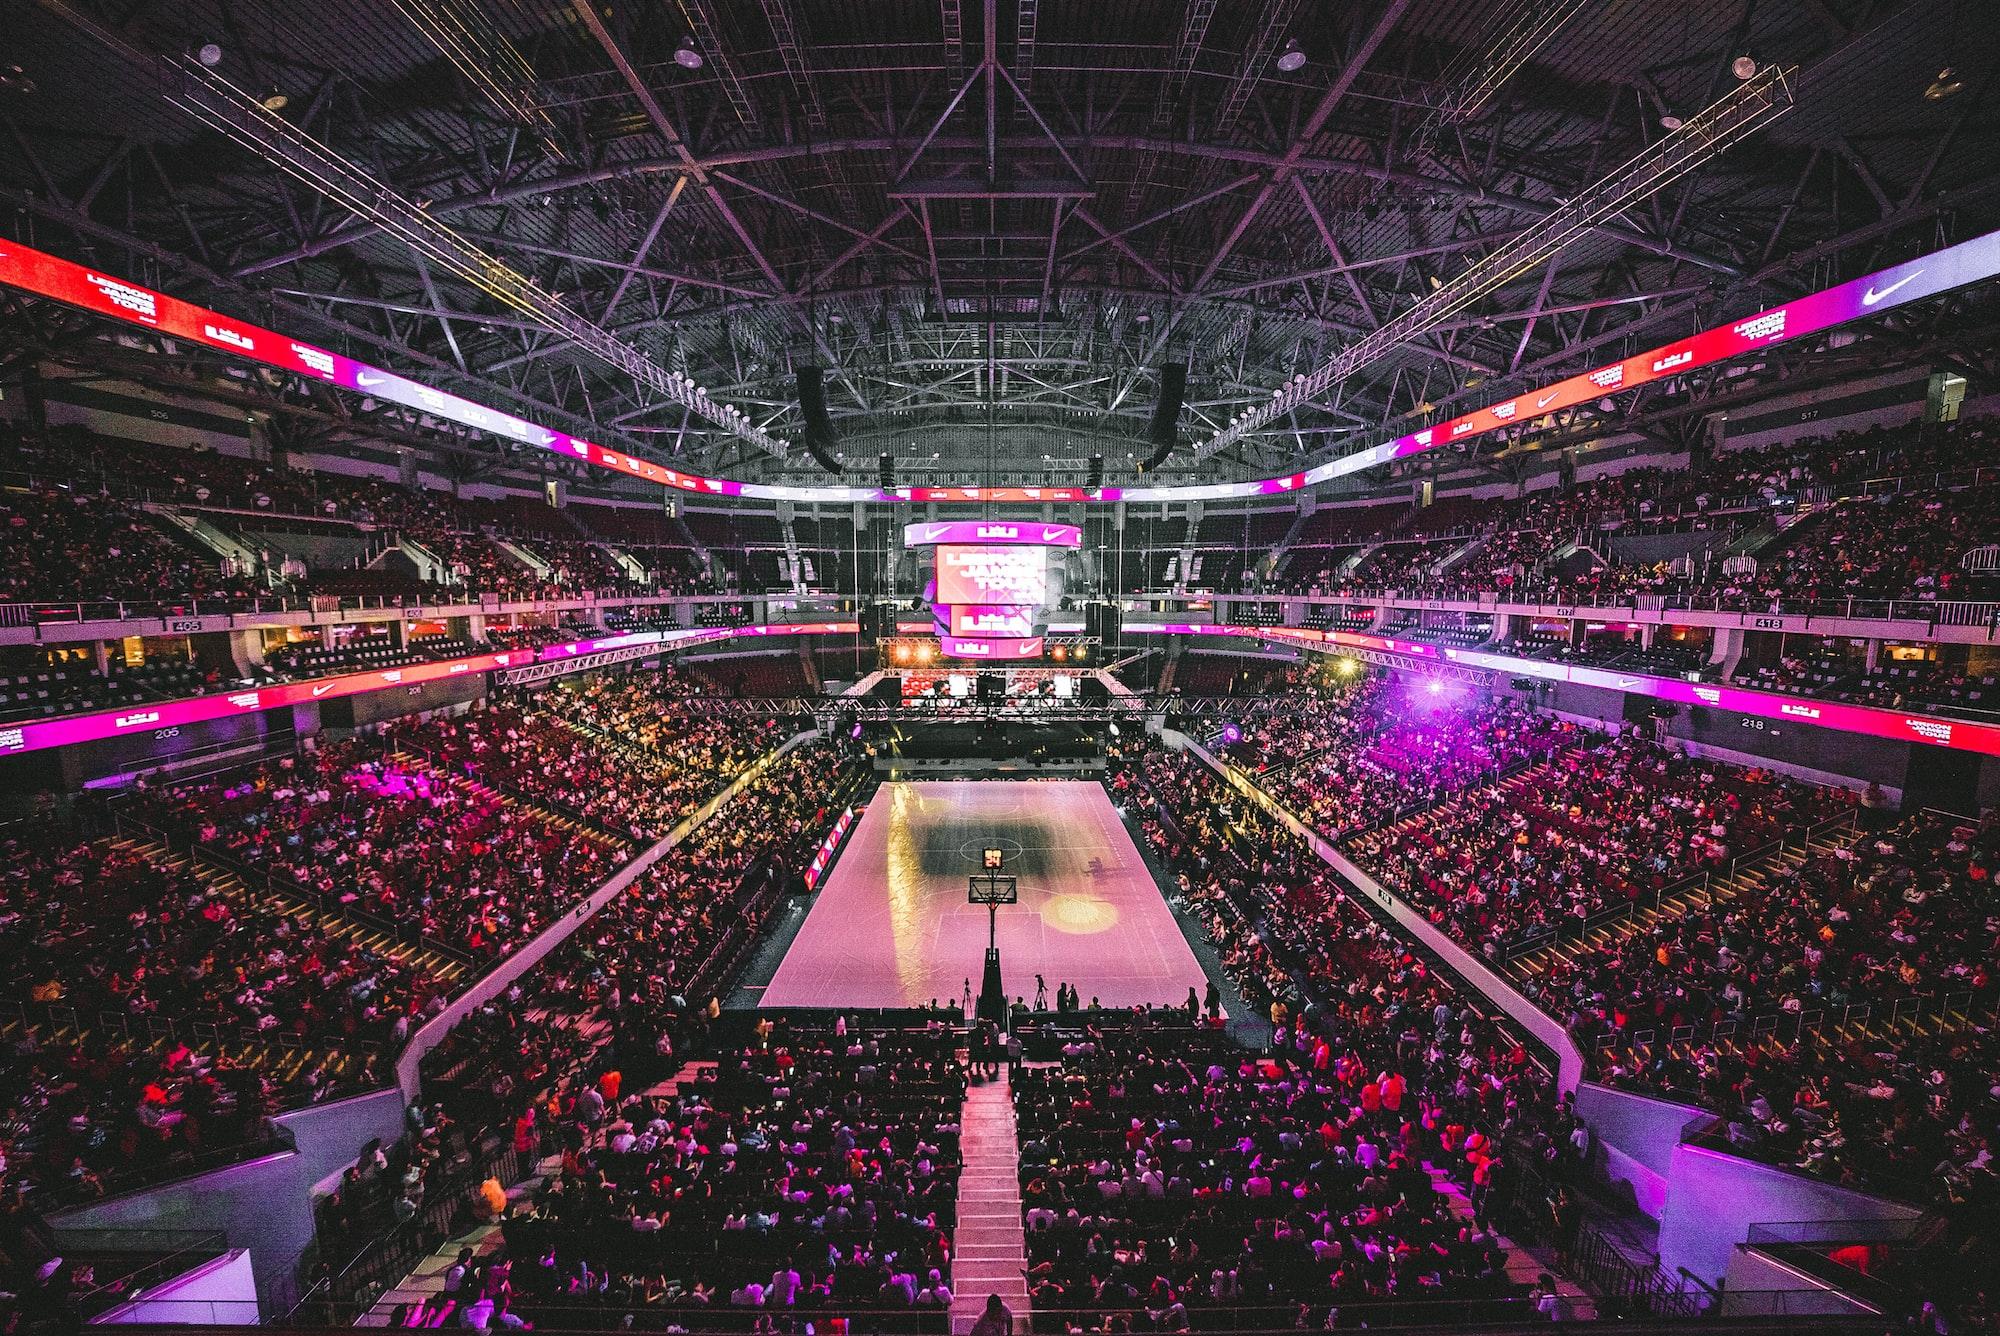 Pronostico NBA Finals gara 6 21/07/2021